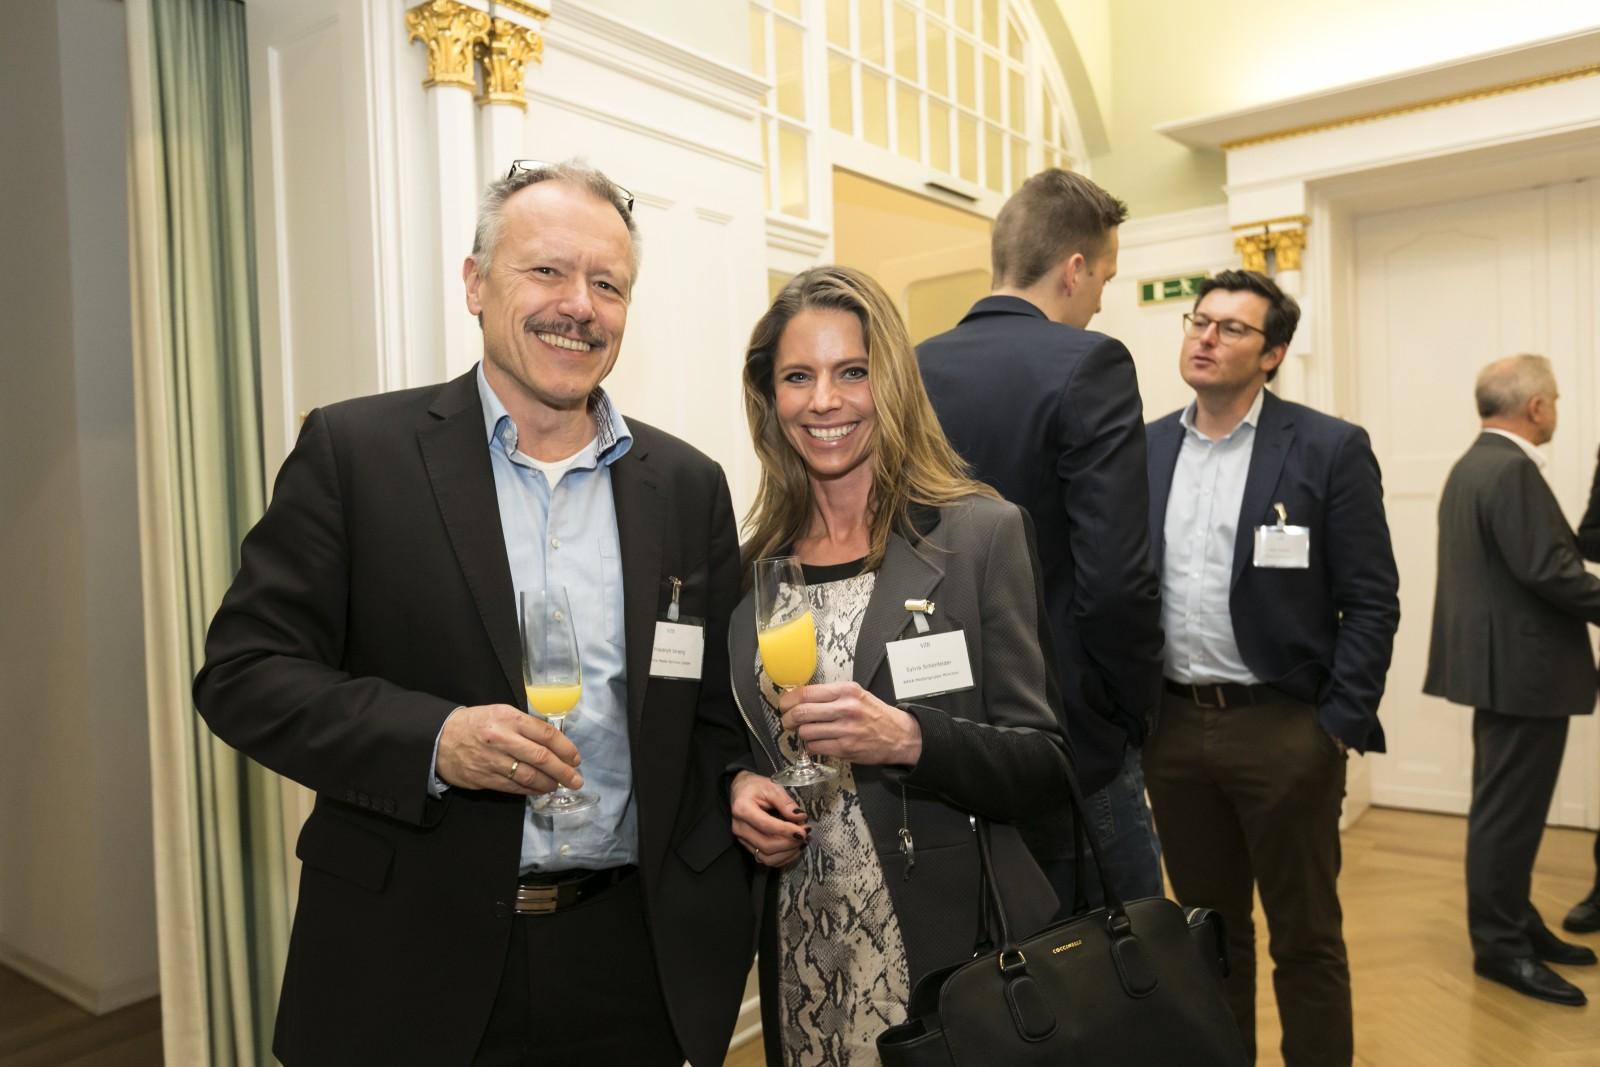 Friedrich Streng, InTime Media Services; Sylvia Schönfelder, WEKA Mediengruppe